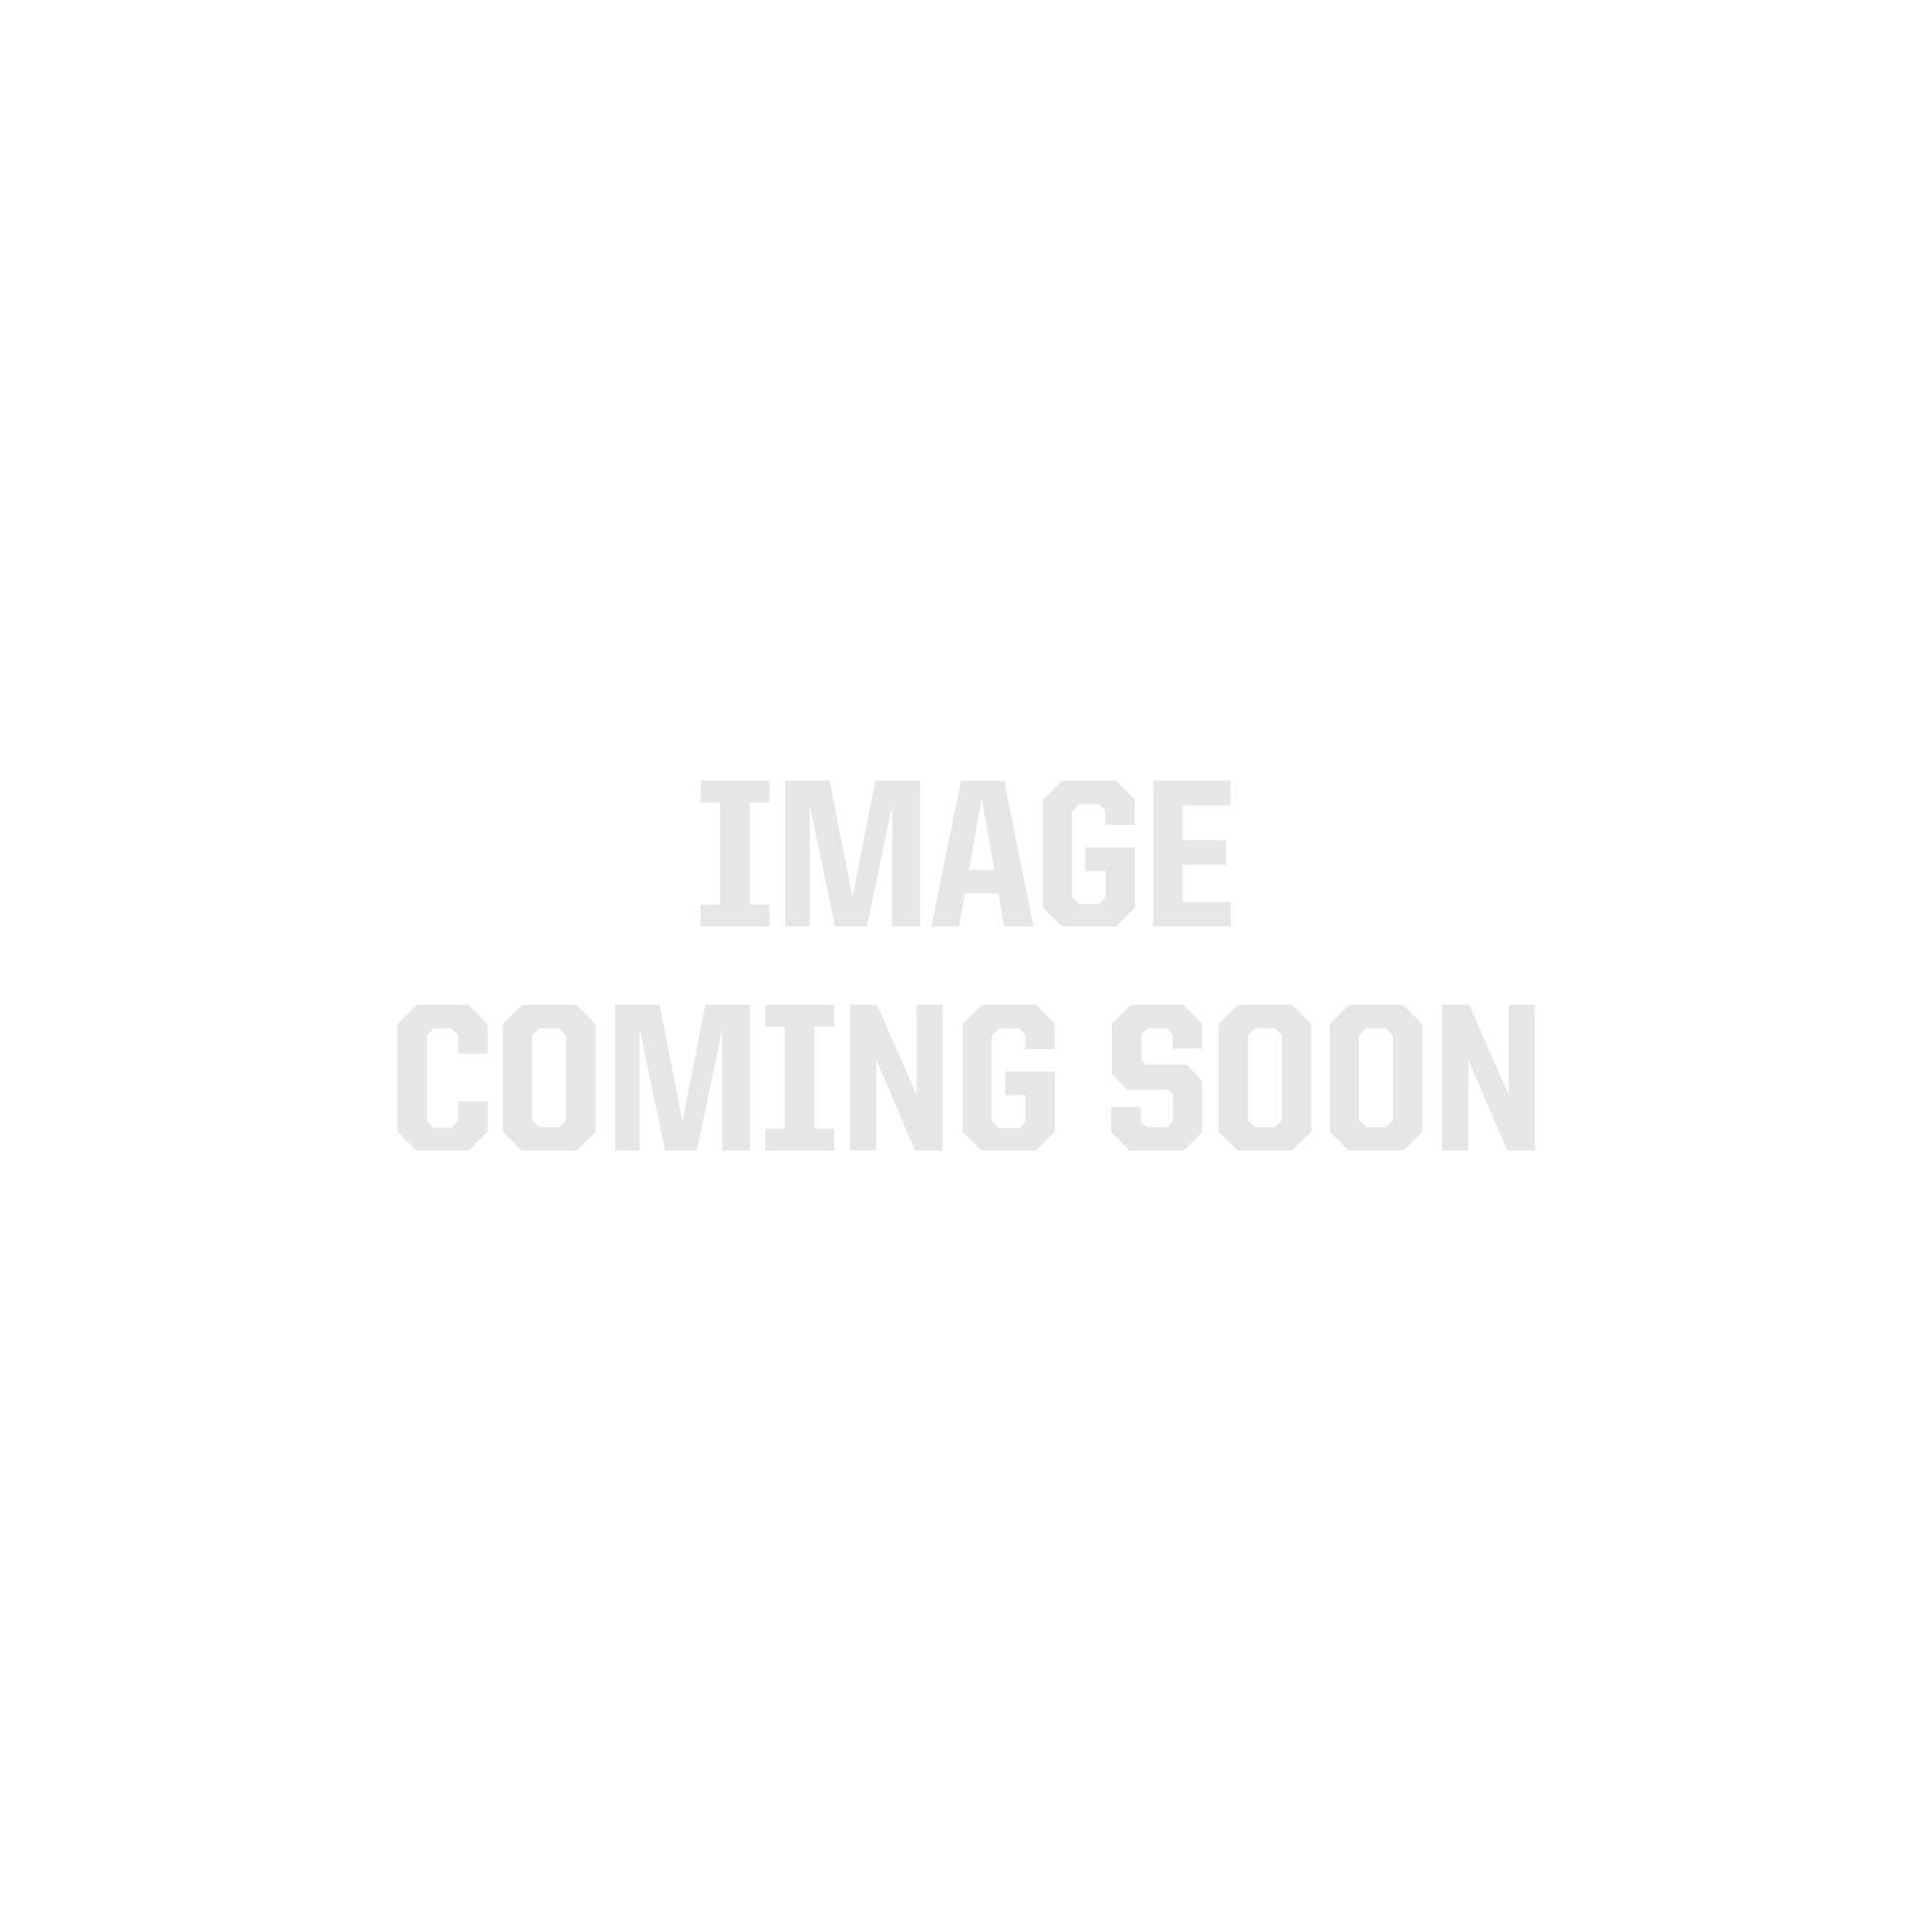 e84f8691c0 5.11 Tactical Utili-T Crew Shirts, 3 Pack - 5.11 Tactical